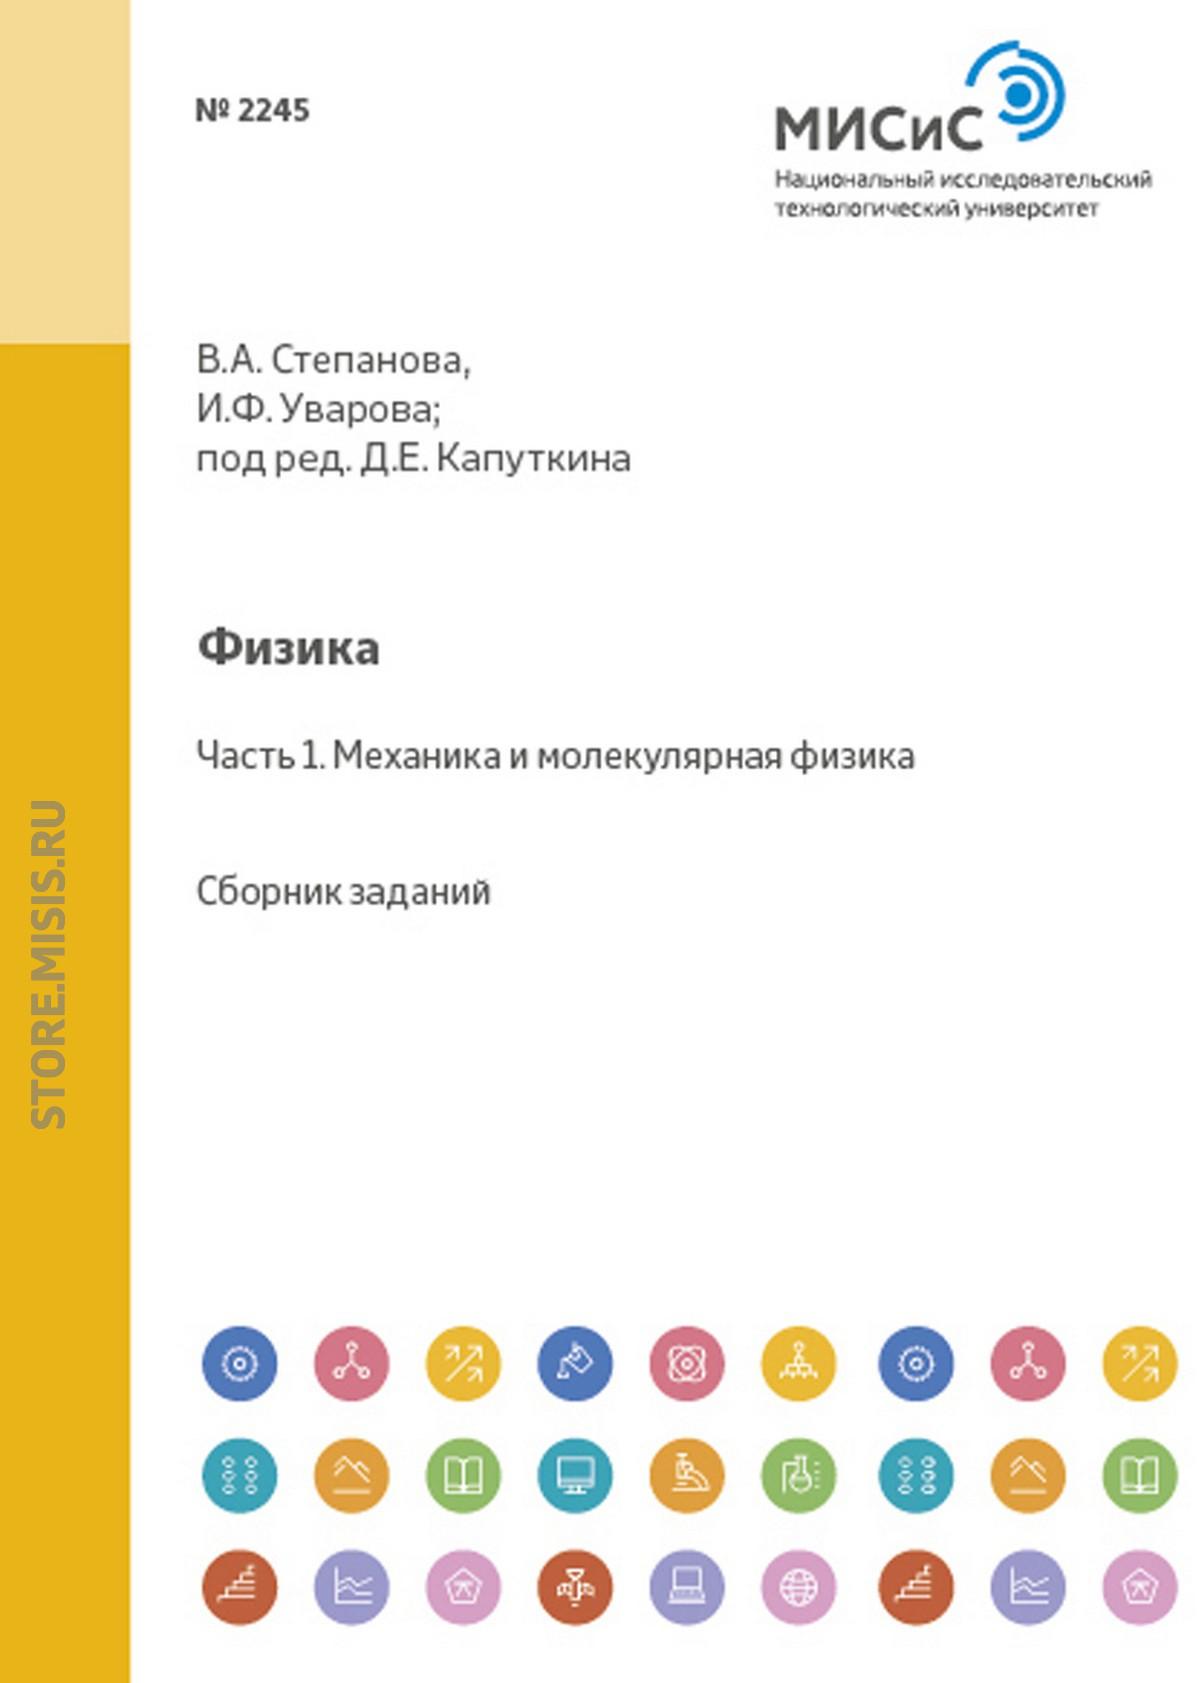 Ирина Уварова Физика. Часть 1. Механика и молекулярная физика цена и фото